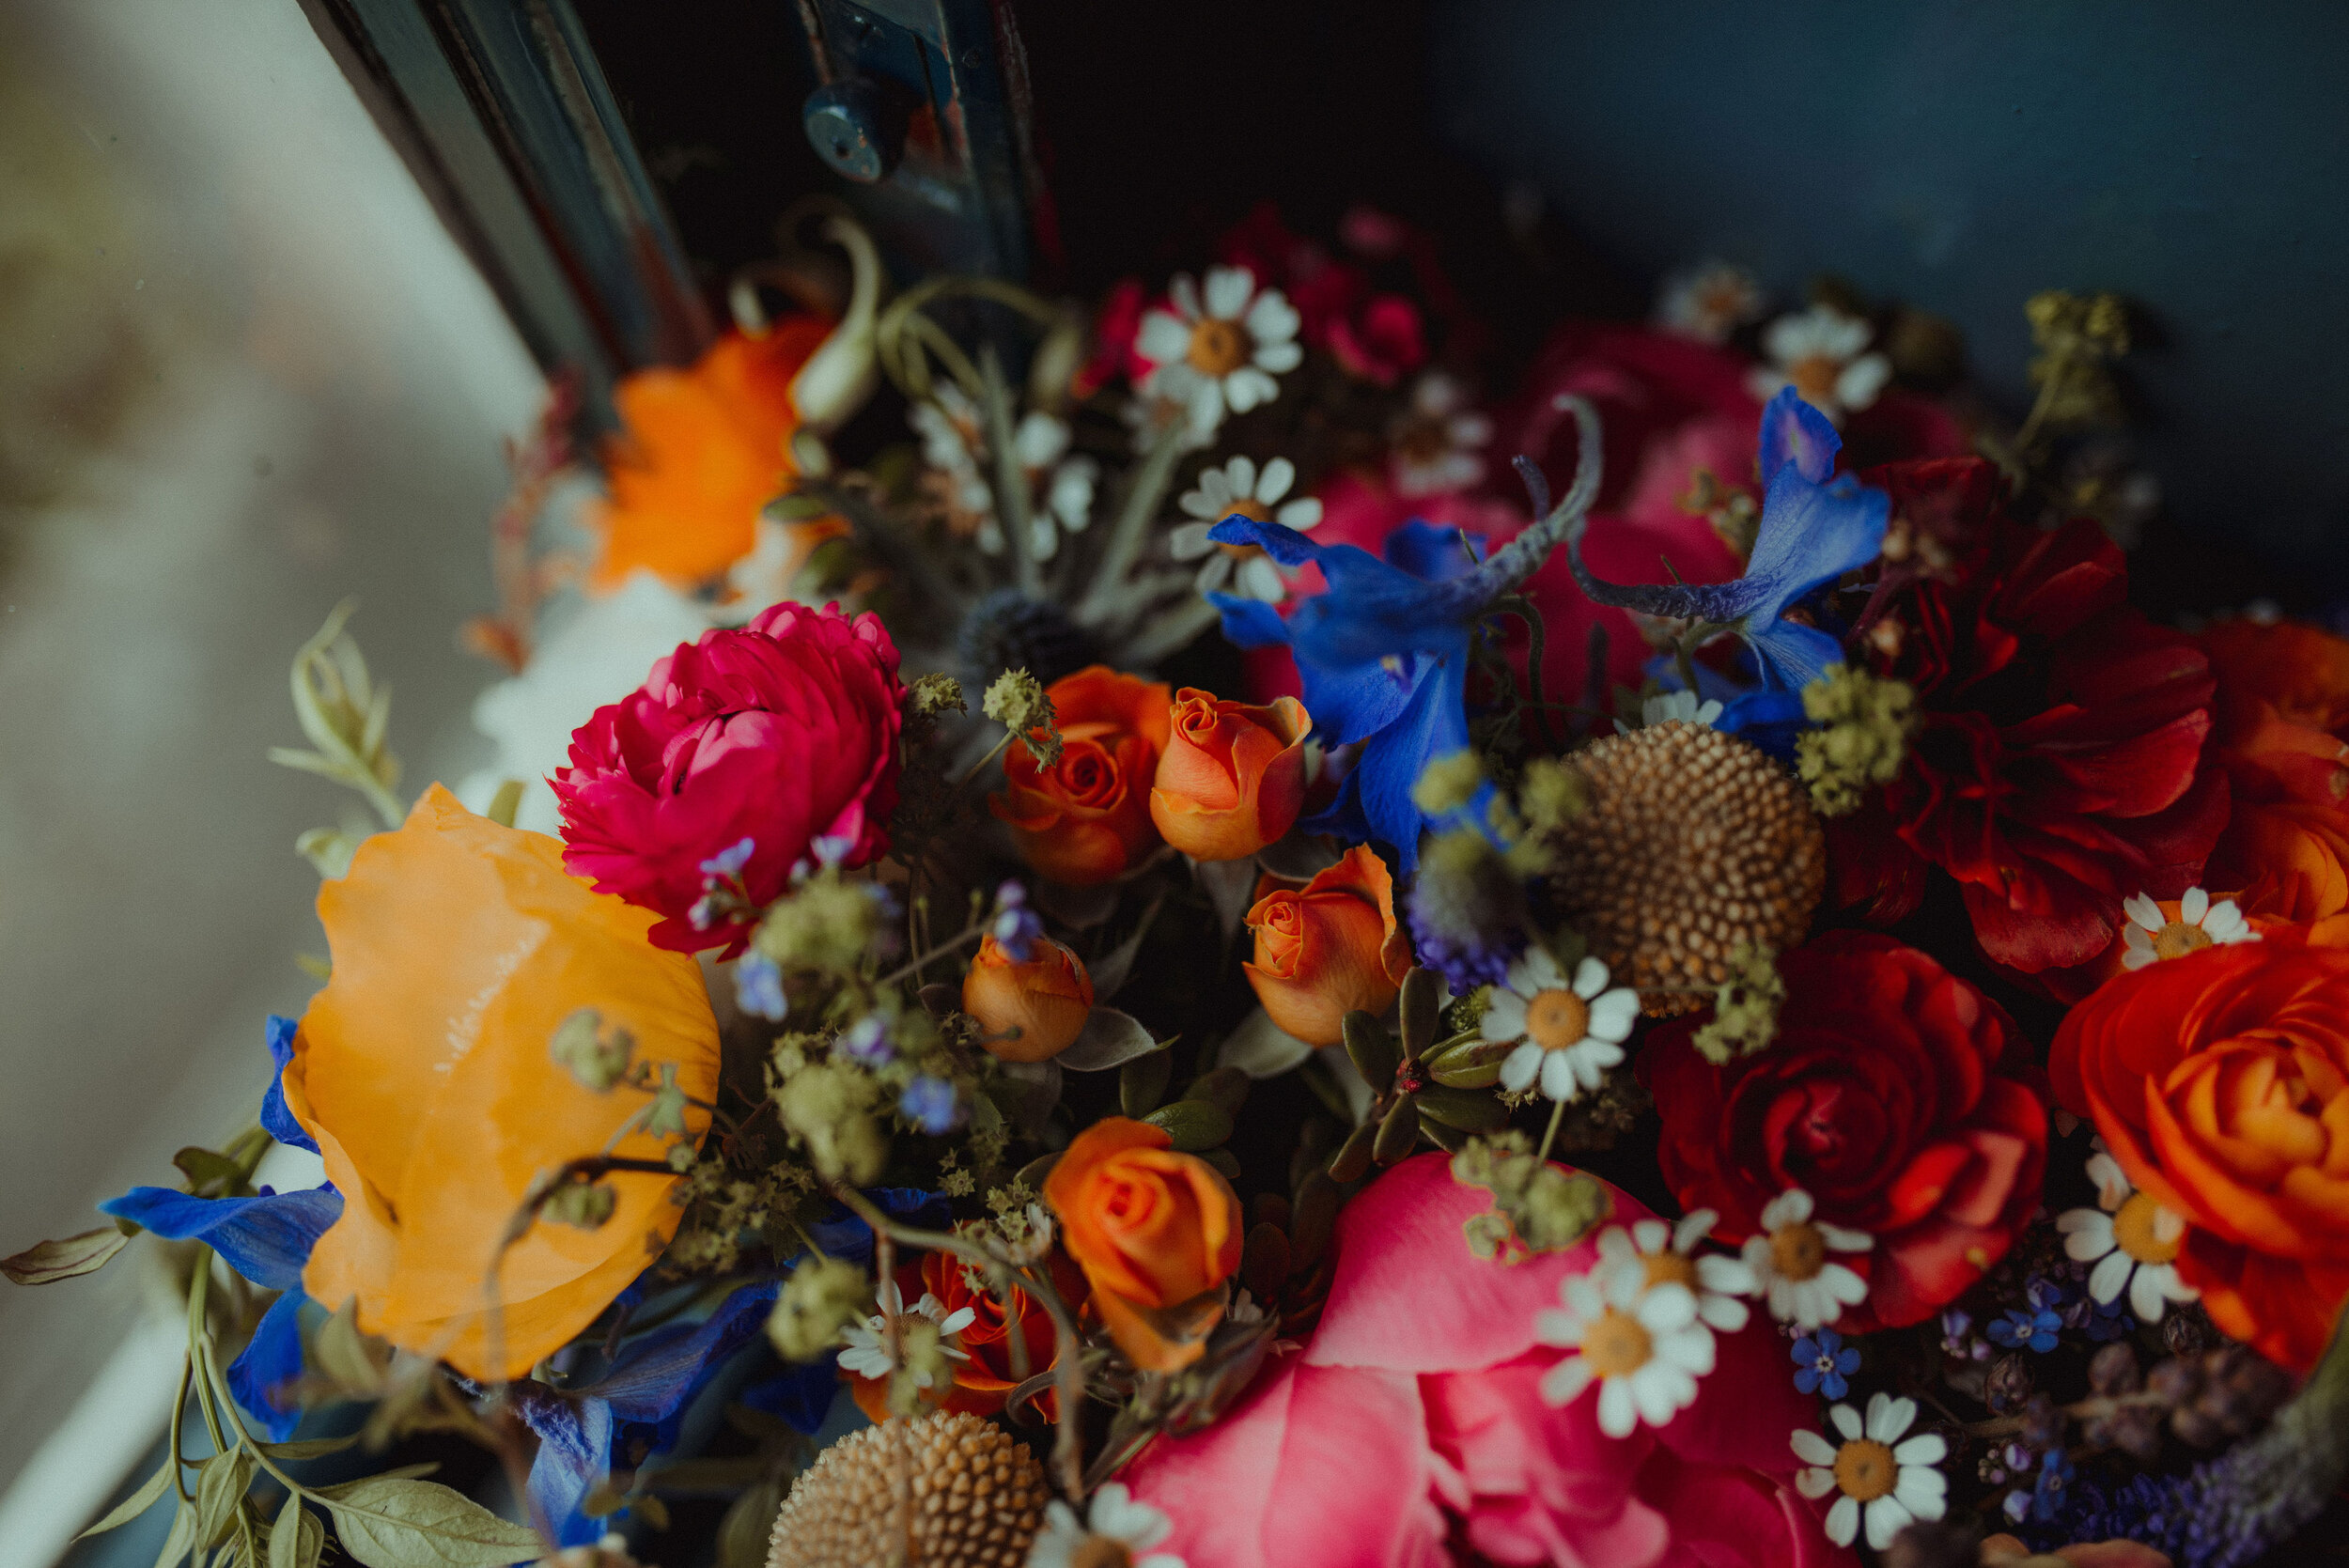 Scottish Wedding Wild Flower Florist Blog Sustainable Wild Flower Wedding And Funeral Flowers By Briar Rose Design